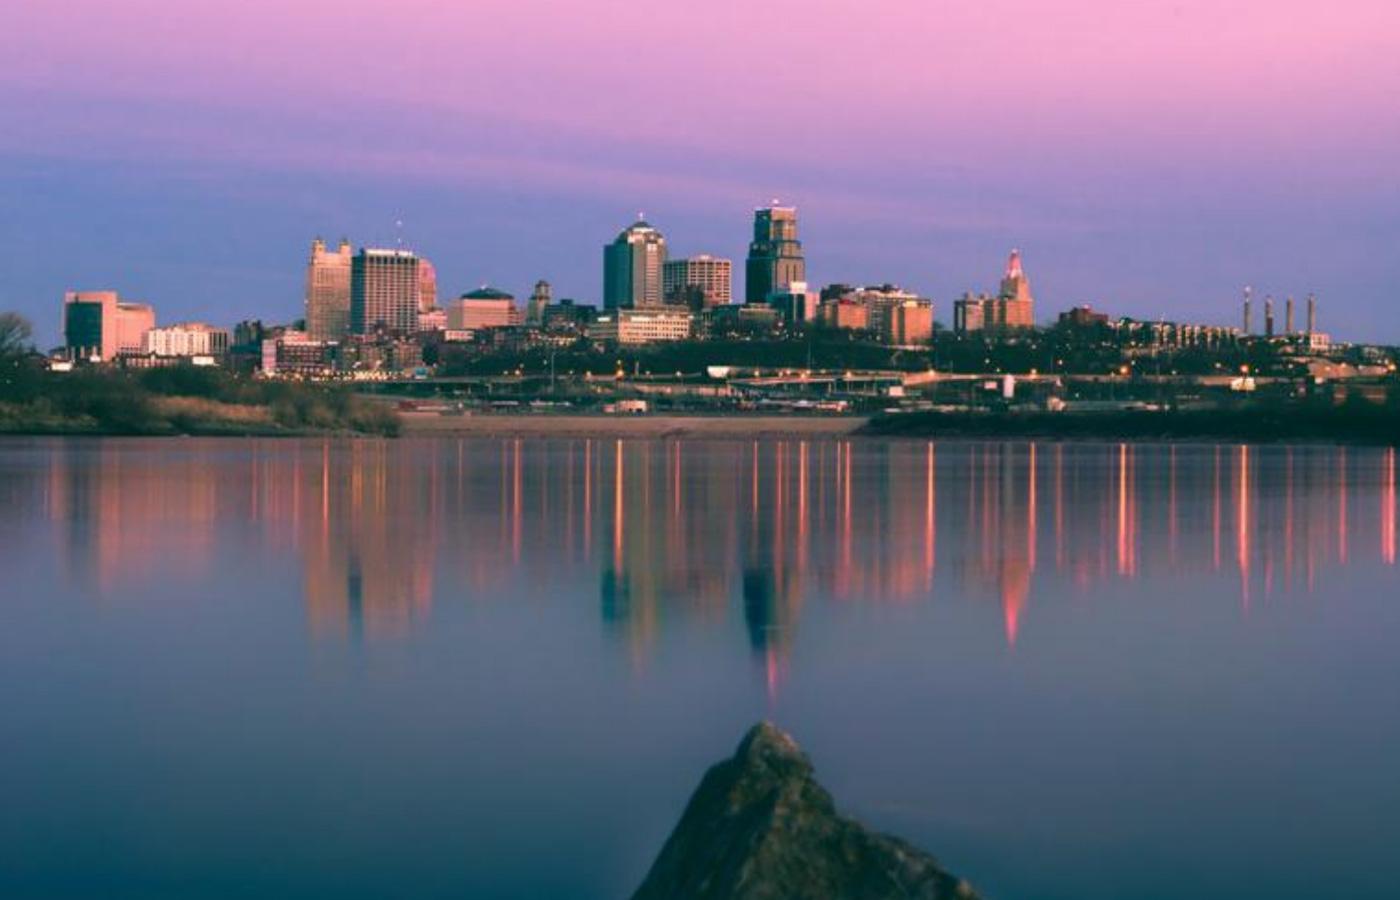 Impact of the COVID-19 Pandemic on the Kansas City Metropolitan Economy